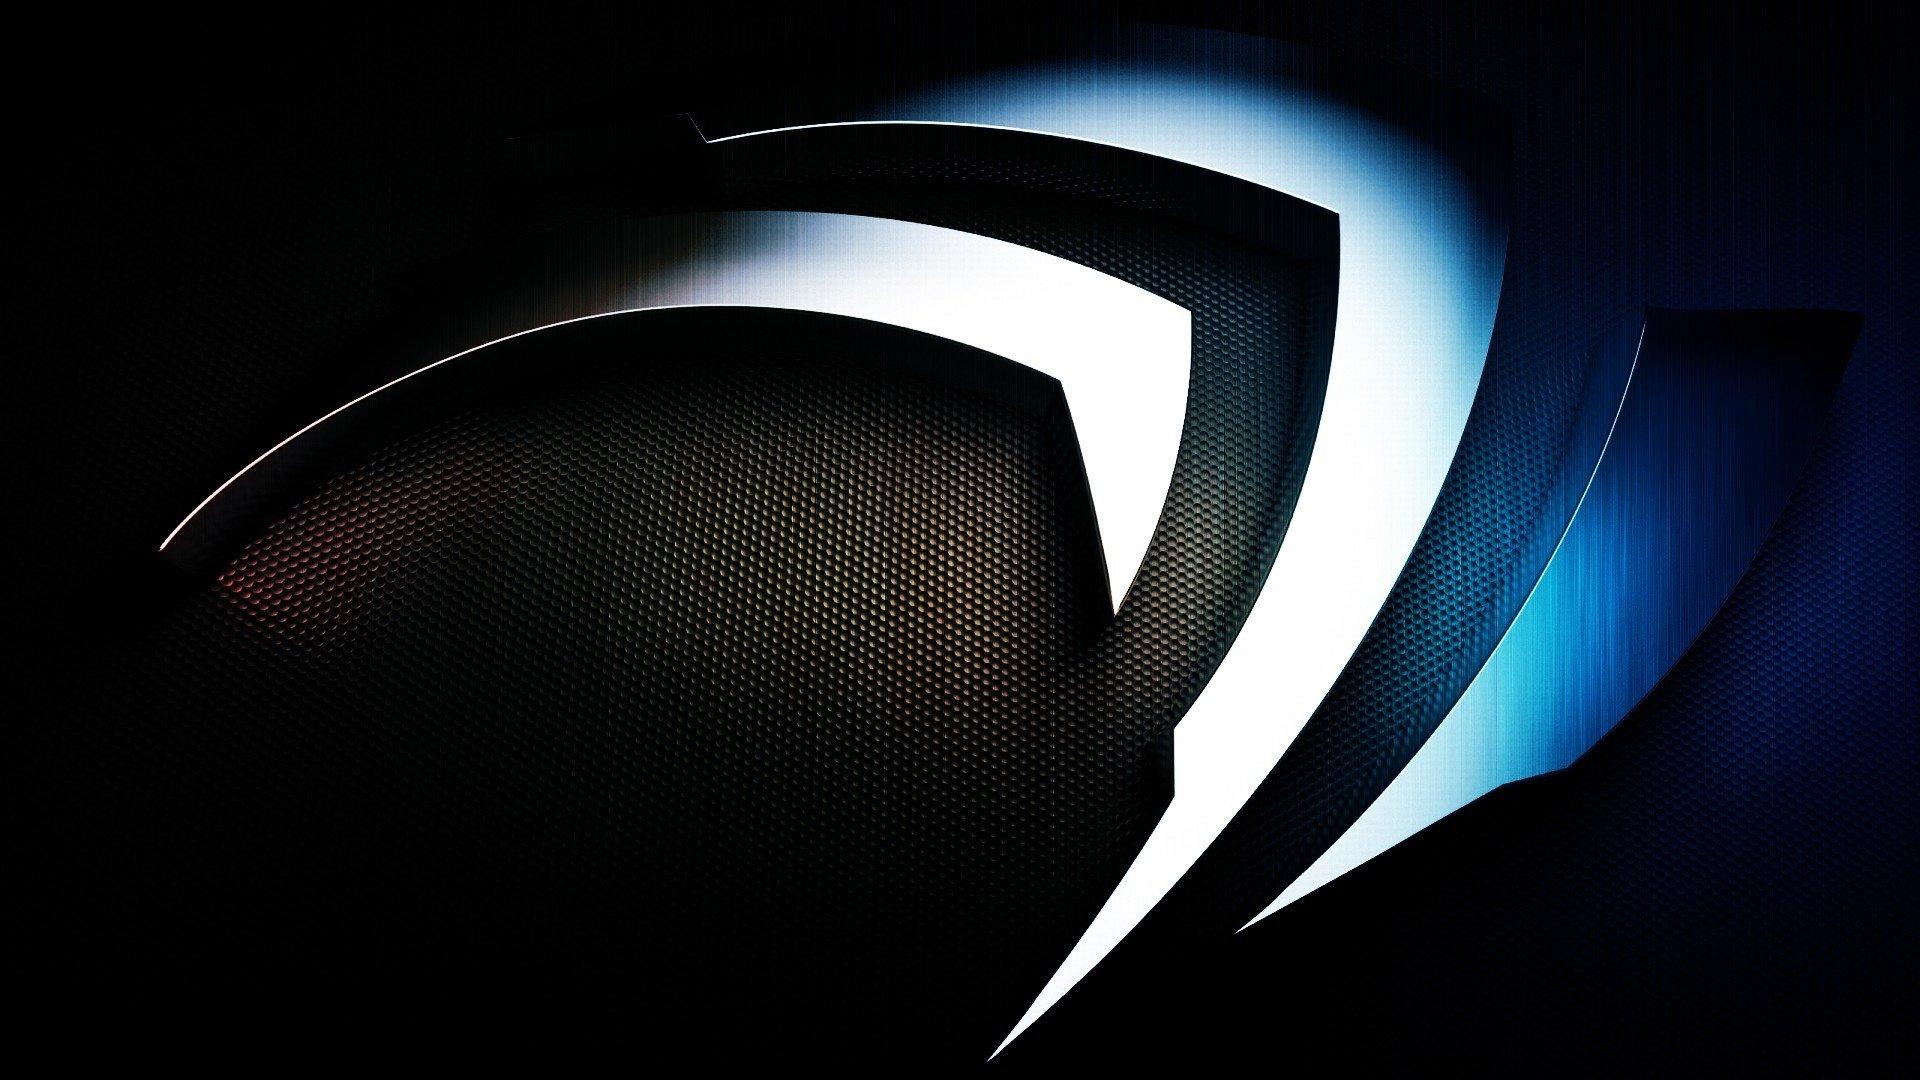 nvidia wallpaper 1600x900 - photo #10